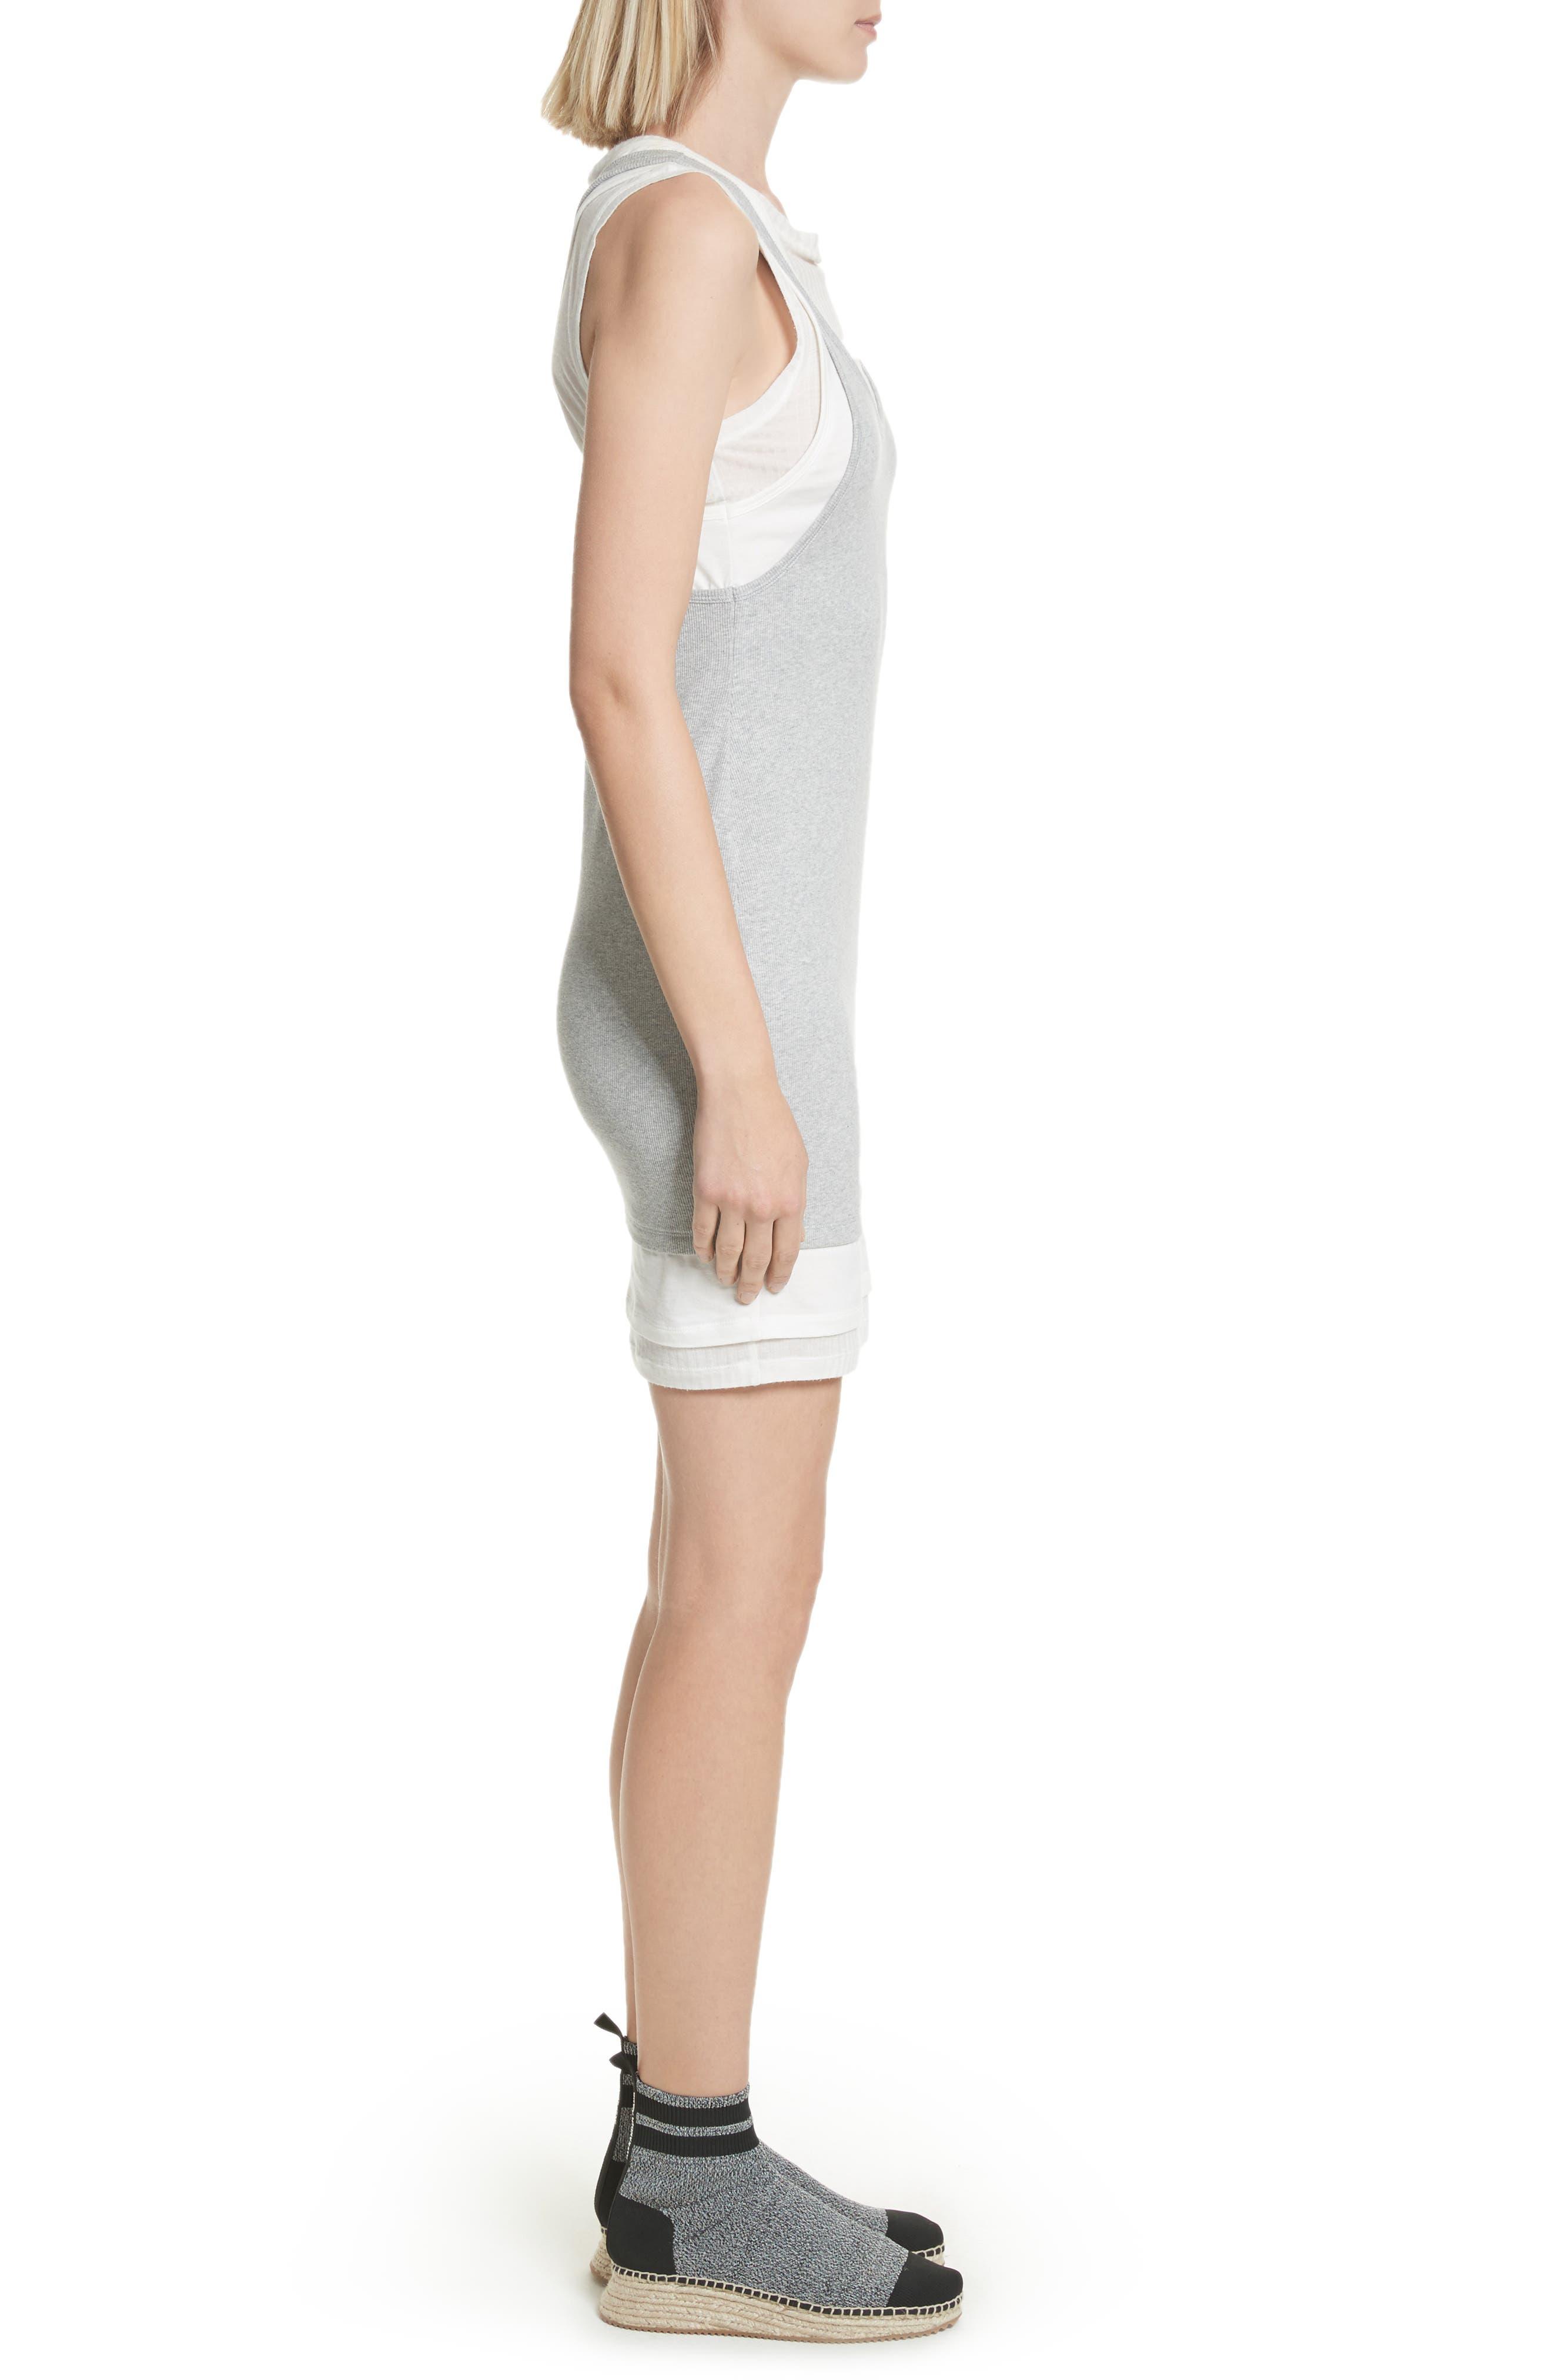 Alexander Wang Layered Mixed Media Dress,                             Alternate thumbnail 3, color,                             Heather Grey Off White